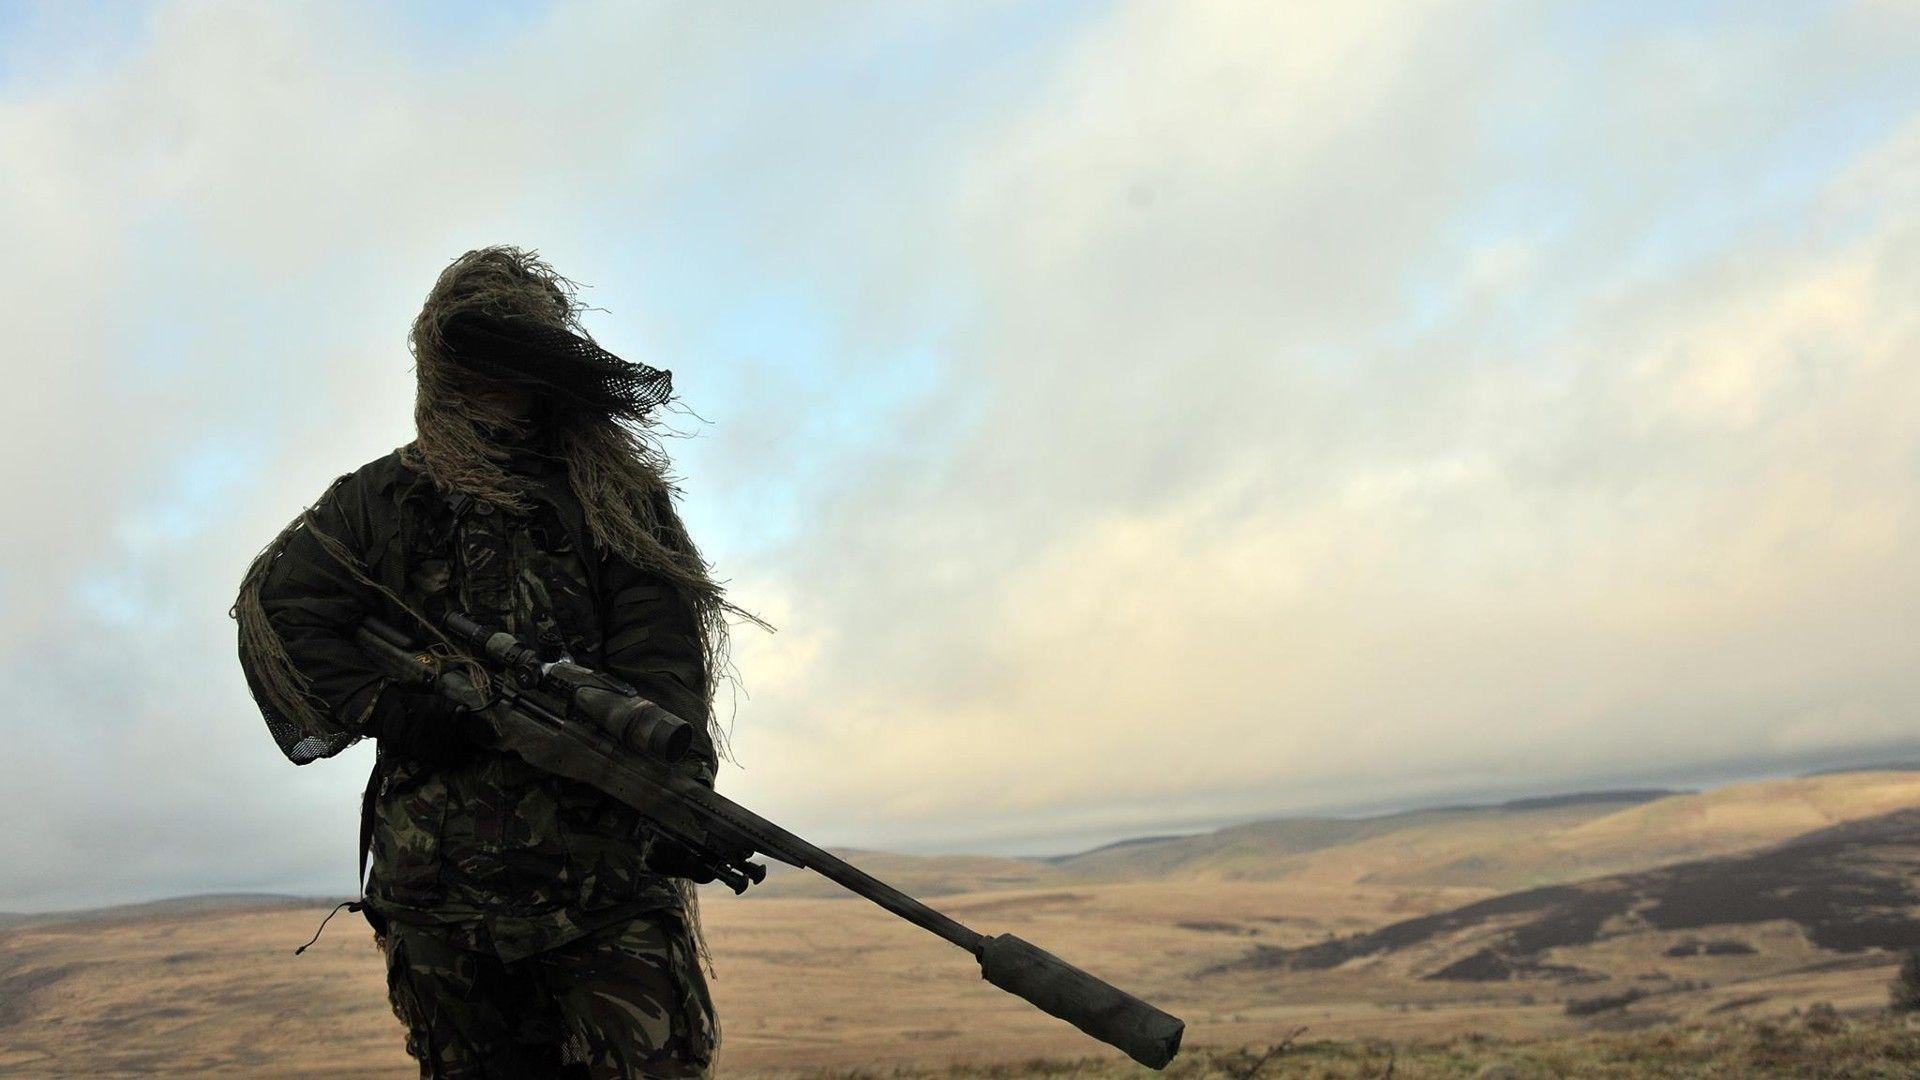 PUBG Sniper Wallpapers - Top Free PUBG Sniper Backgrounds